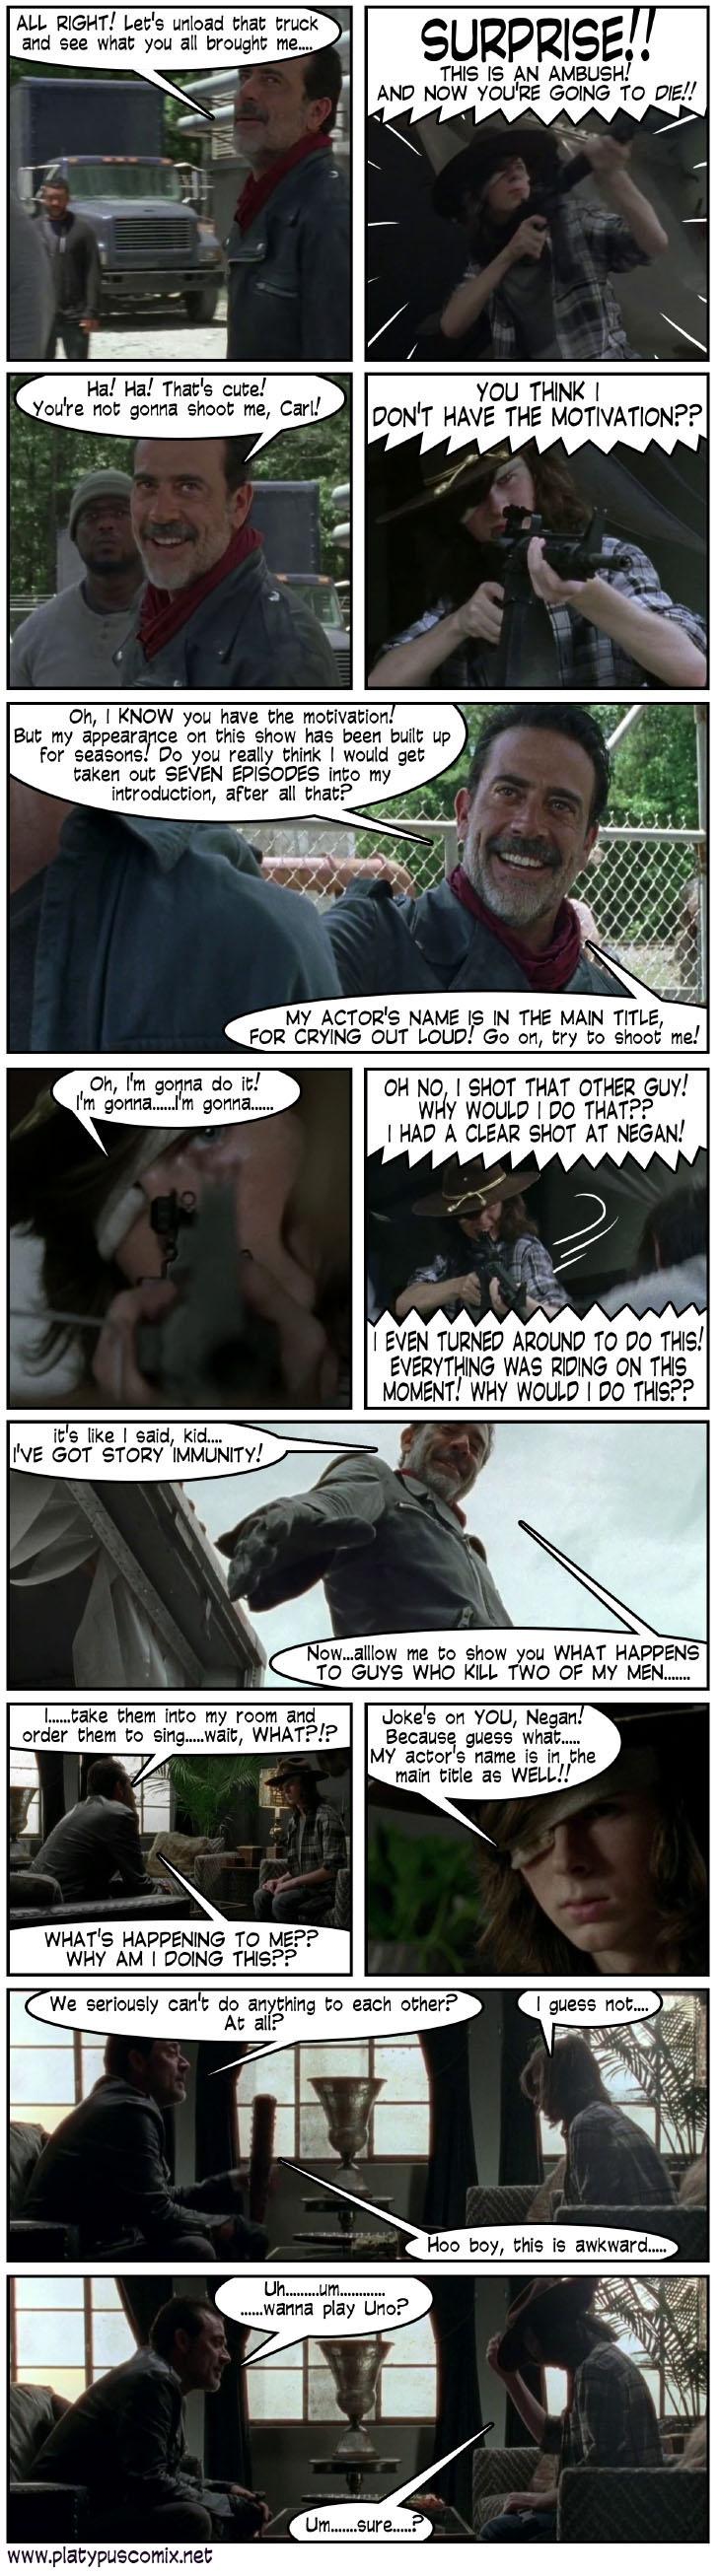 walkingdead6 1 - Carl's Ambush